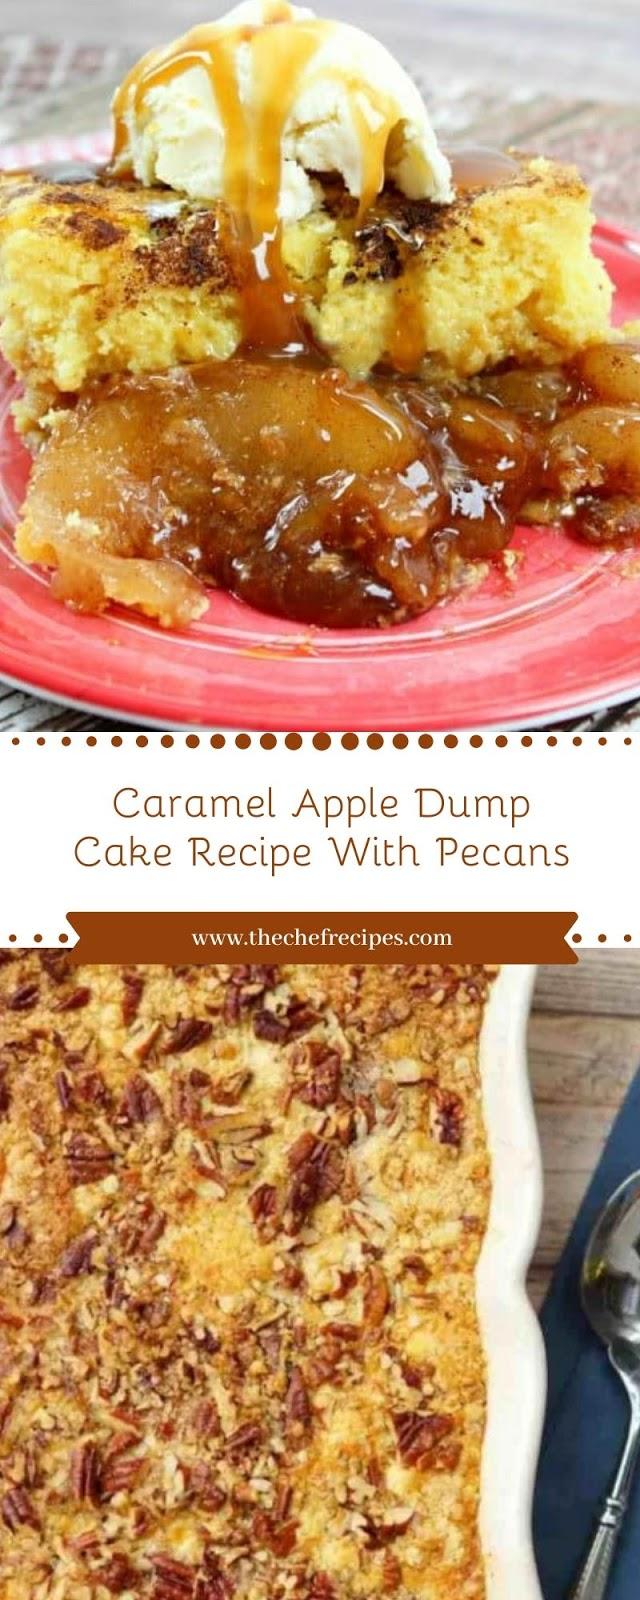 Caramel Apple Dump Cake Recipe With Pecans